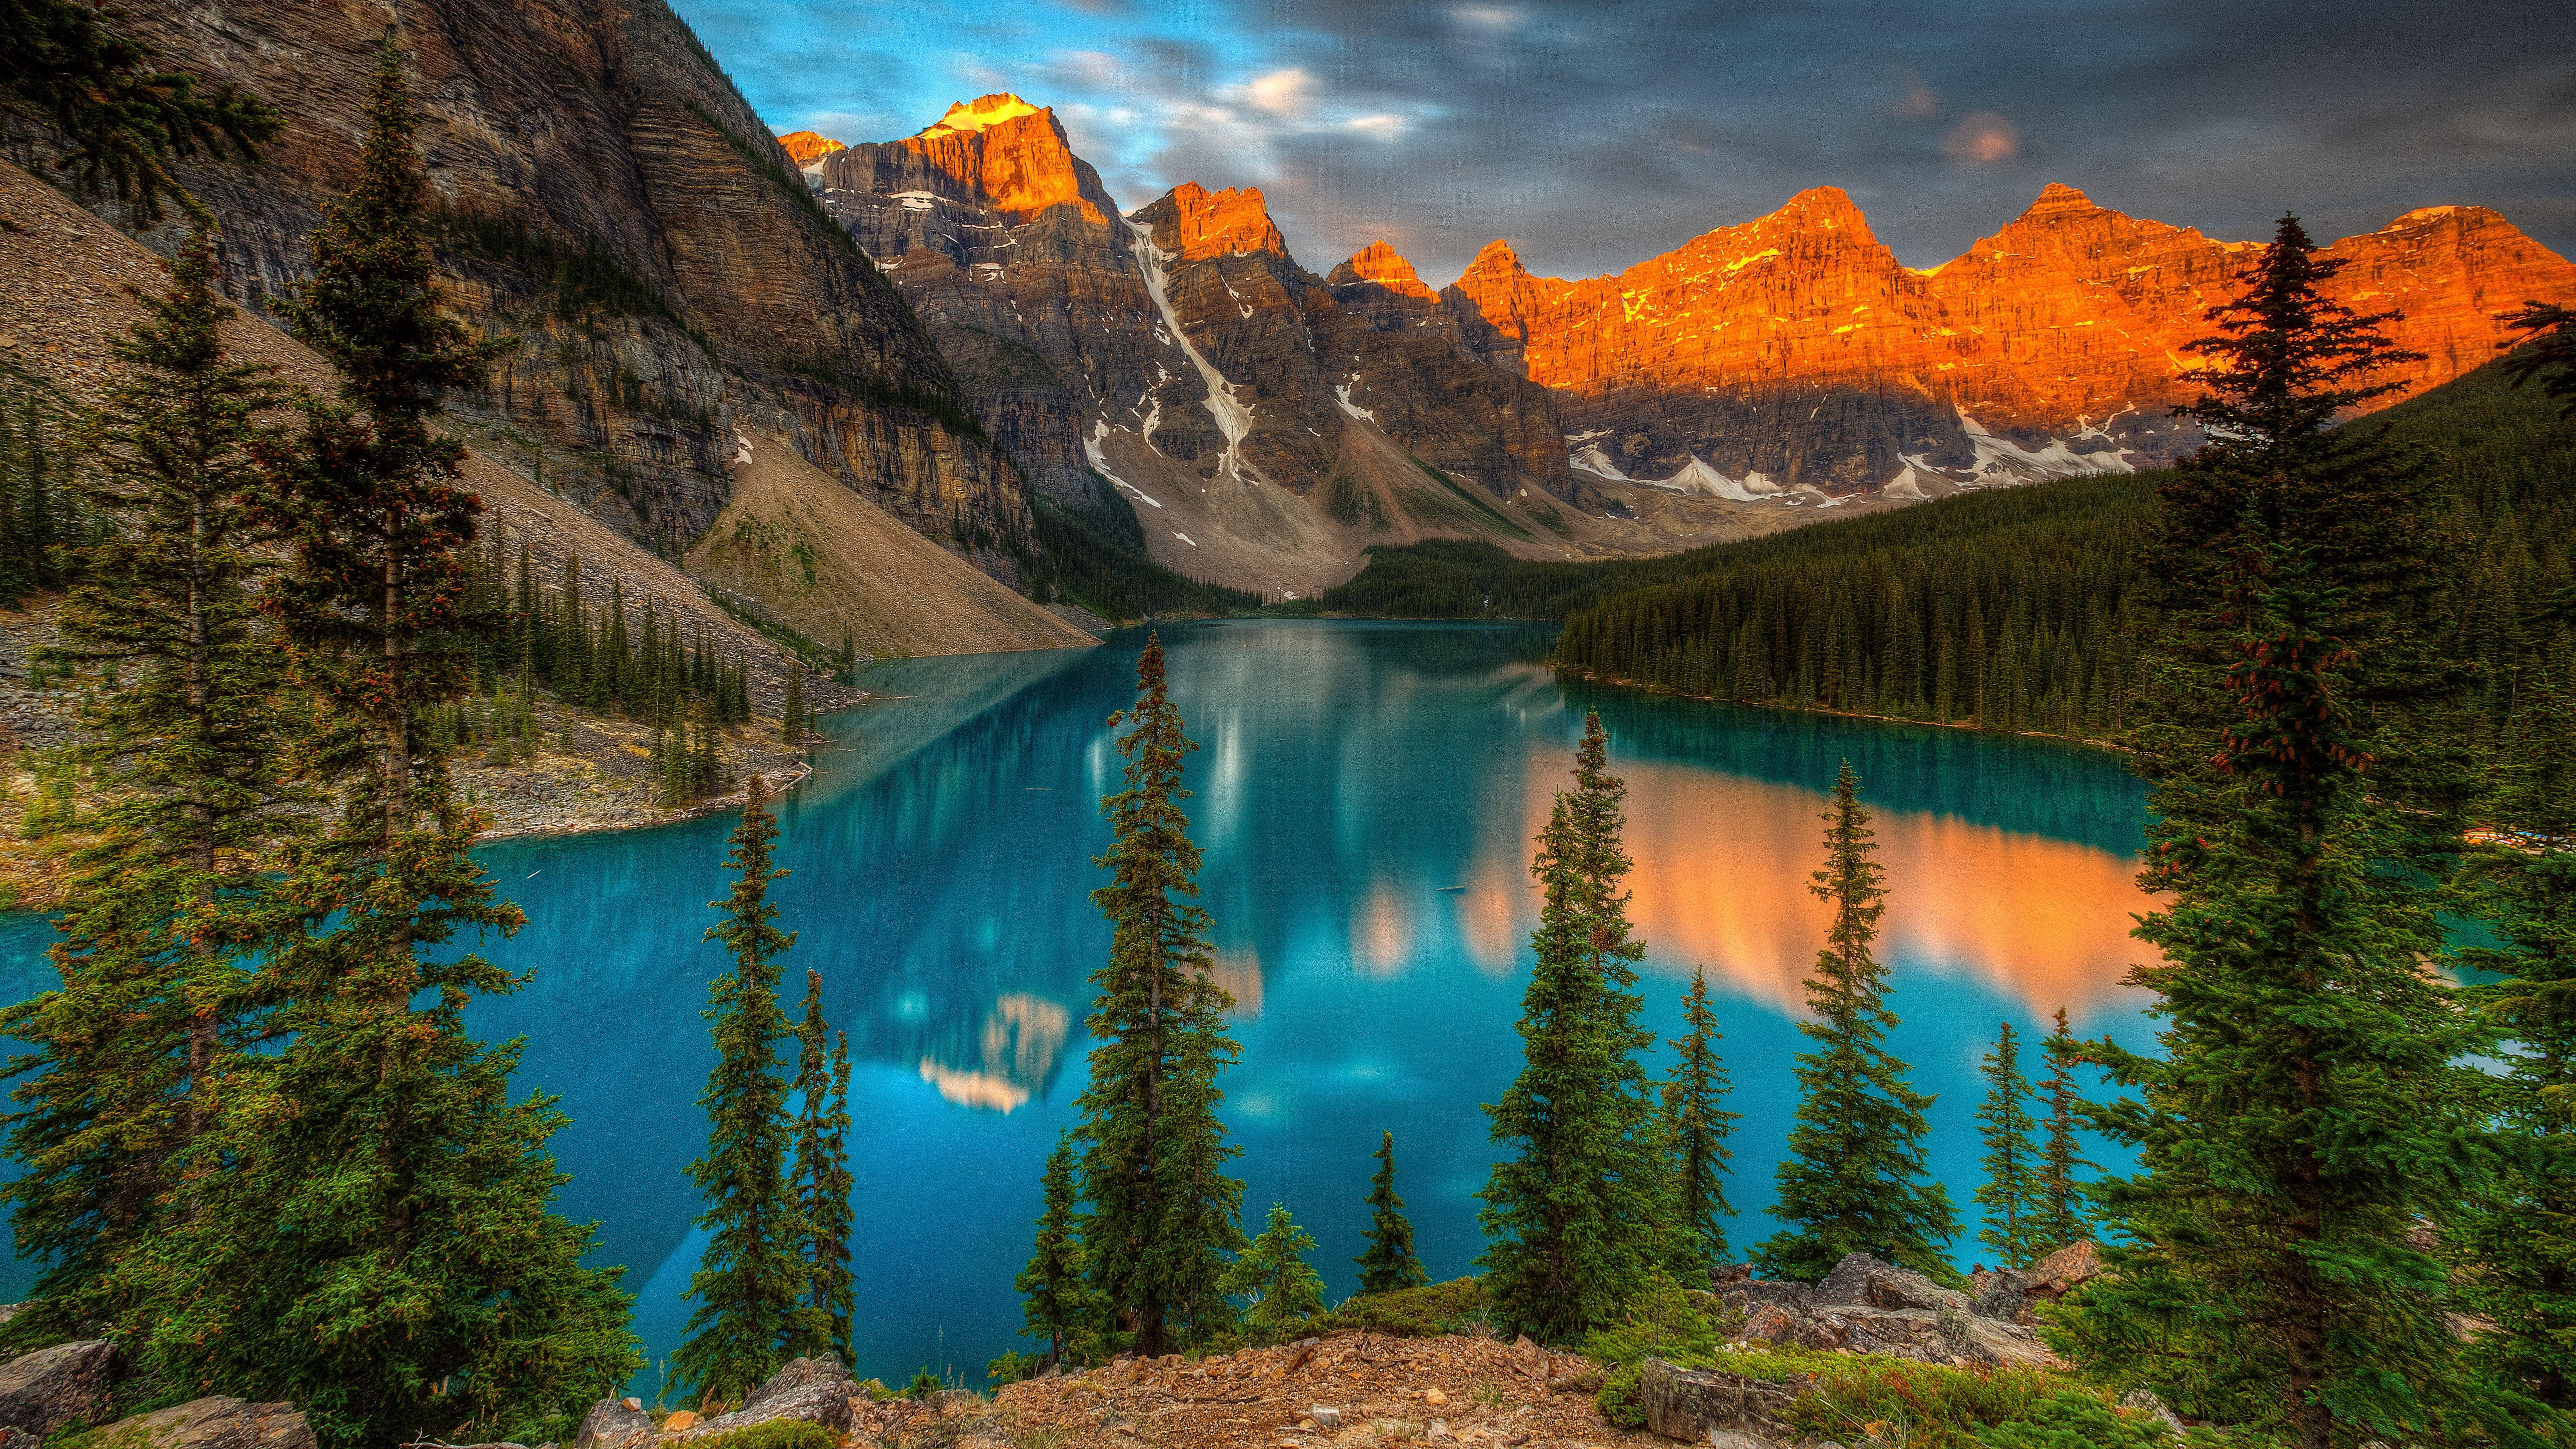 8k Ultra Hd Mountain Lake Nature 8k Wallpaper Hdwallpaper Desktop Moraine Lake Banff National Park Mountain Lake